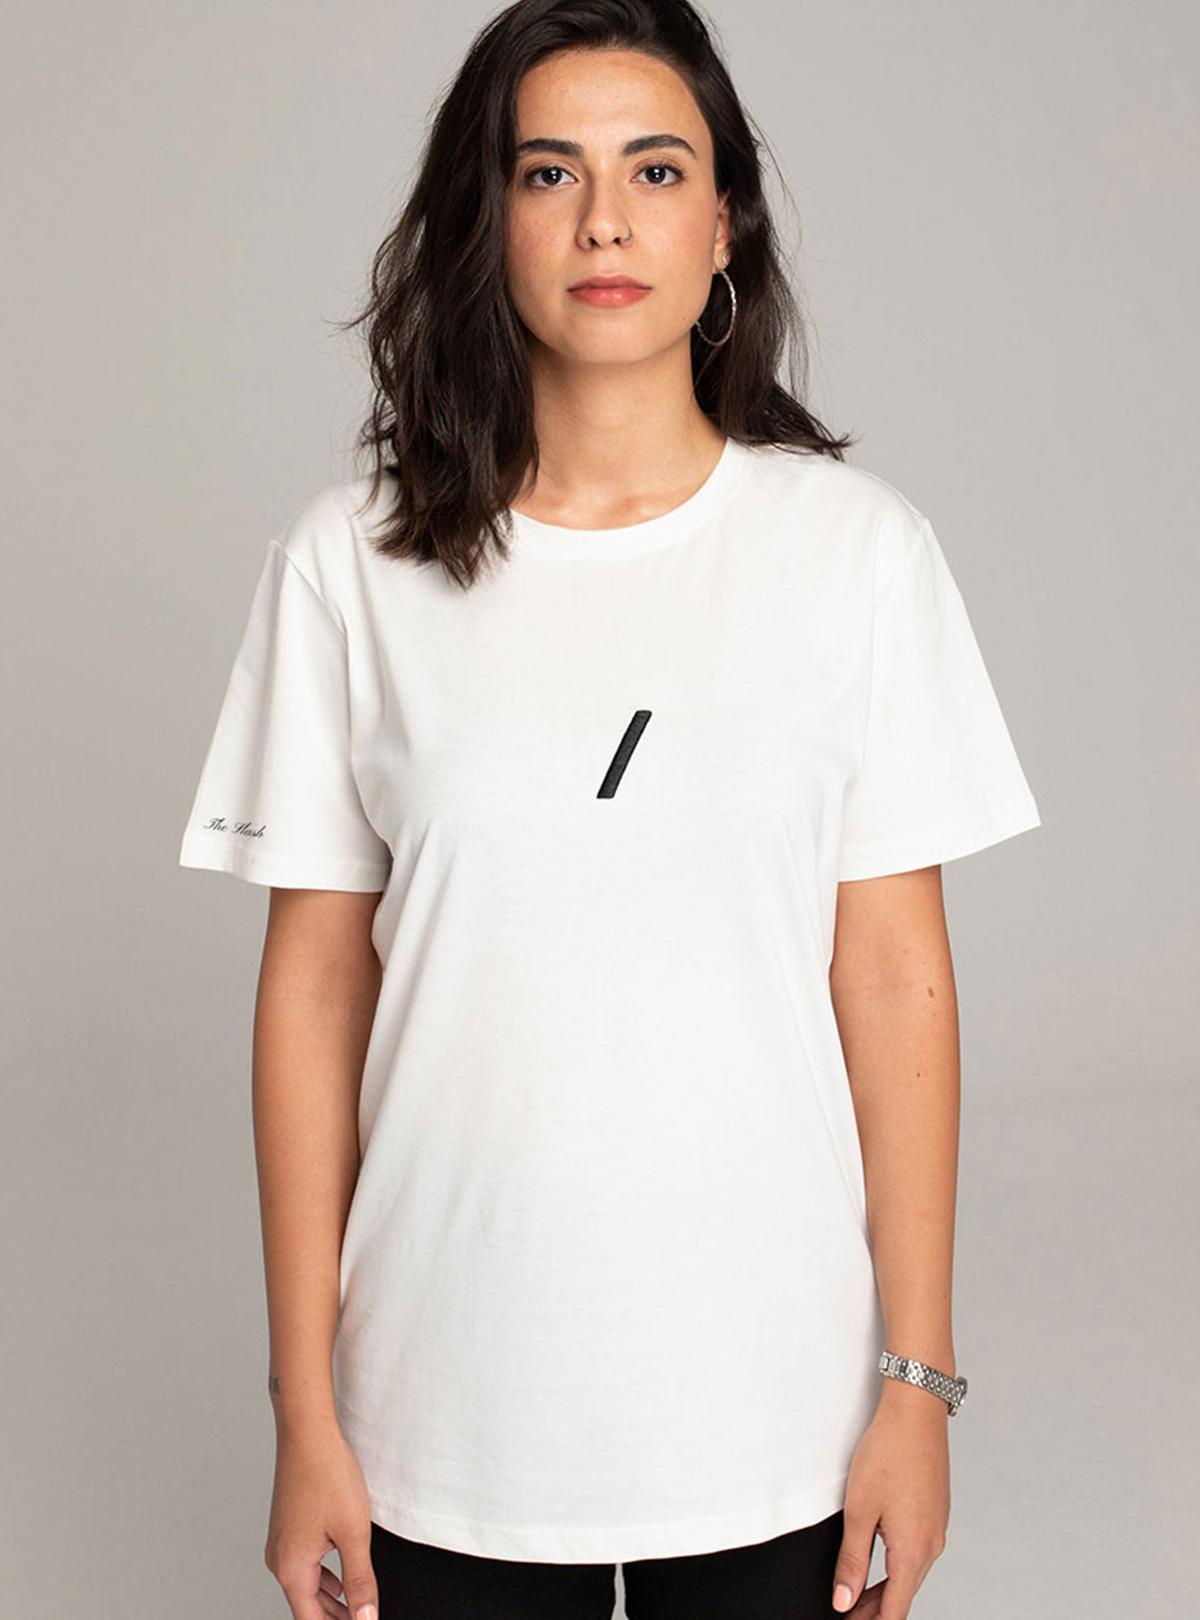 The Basic Collection Kadın - Tshirt Beyaz